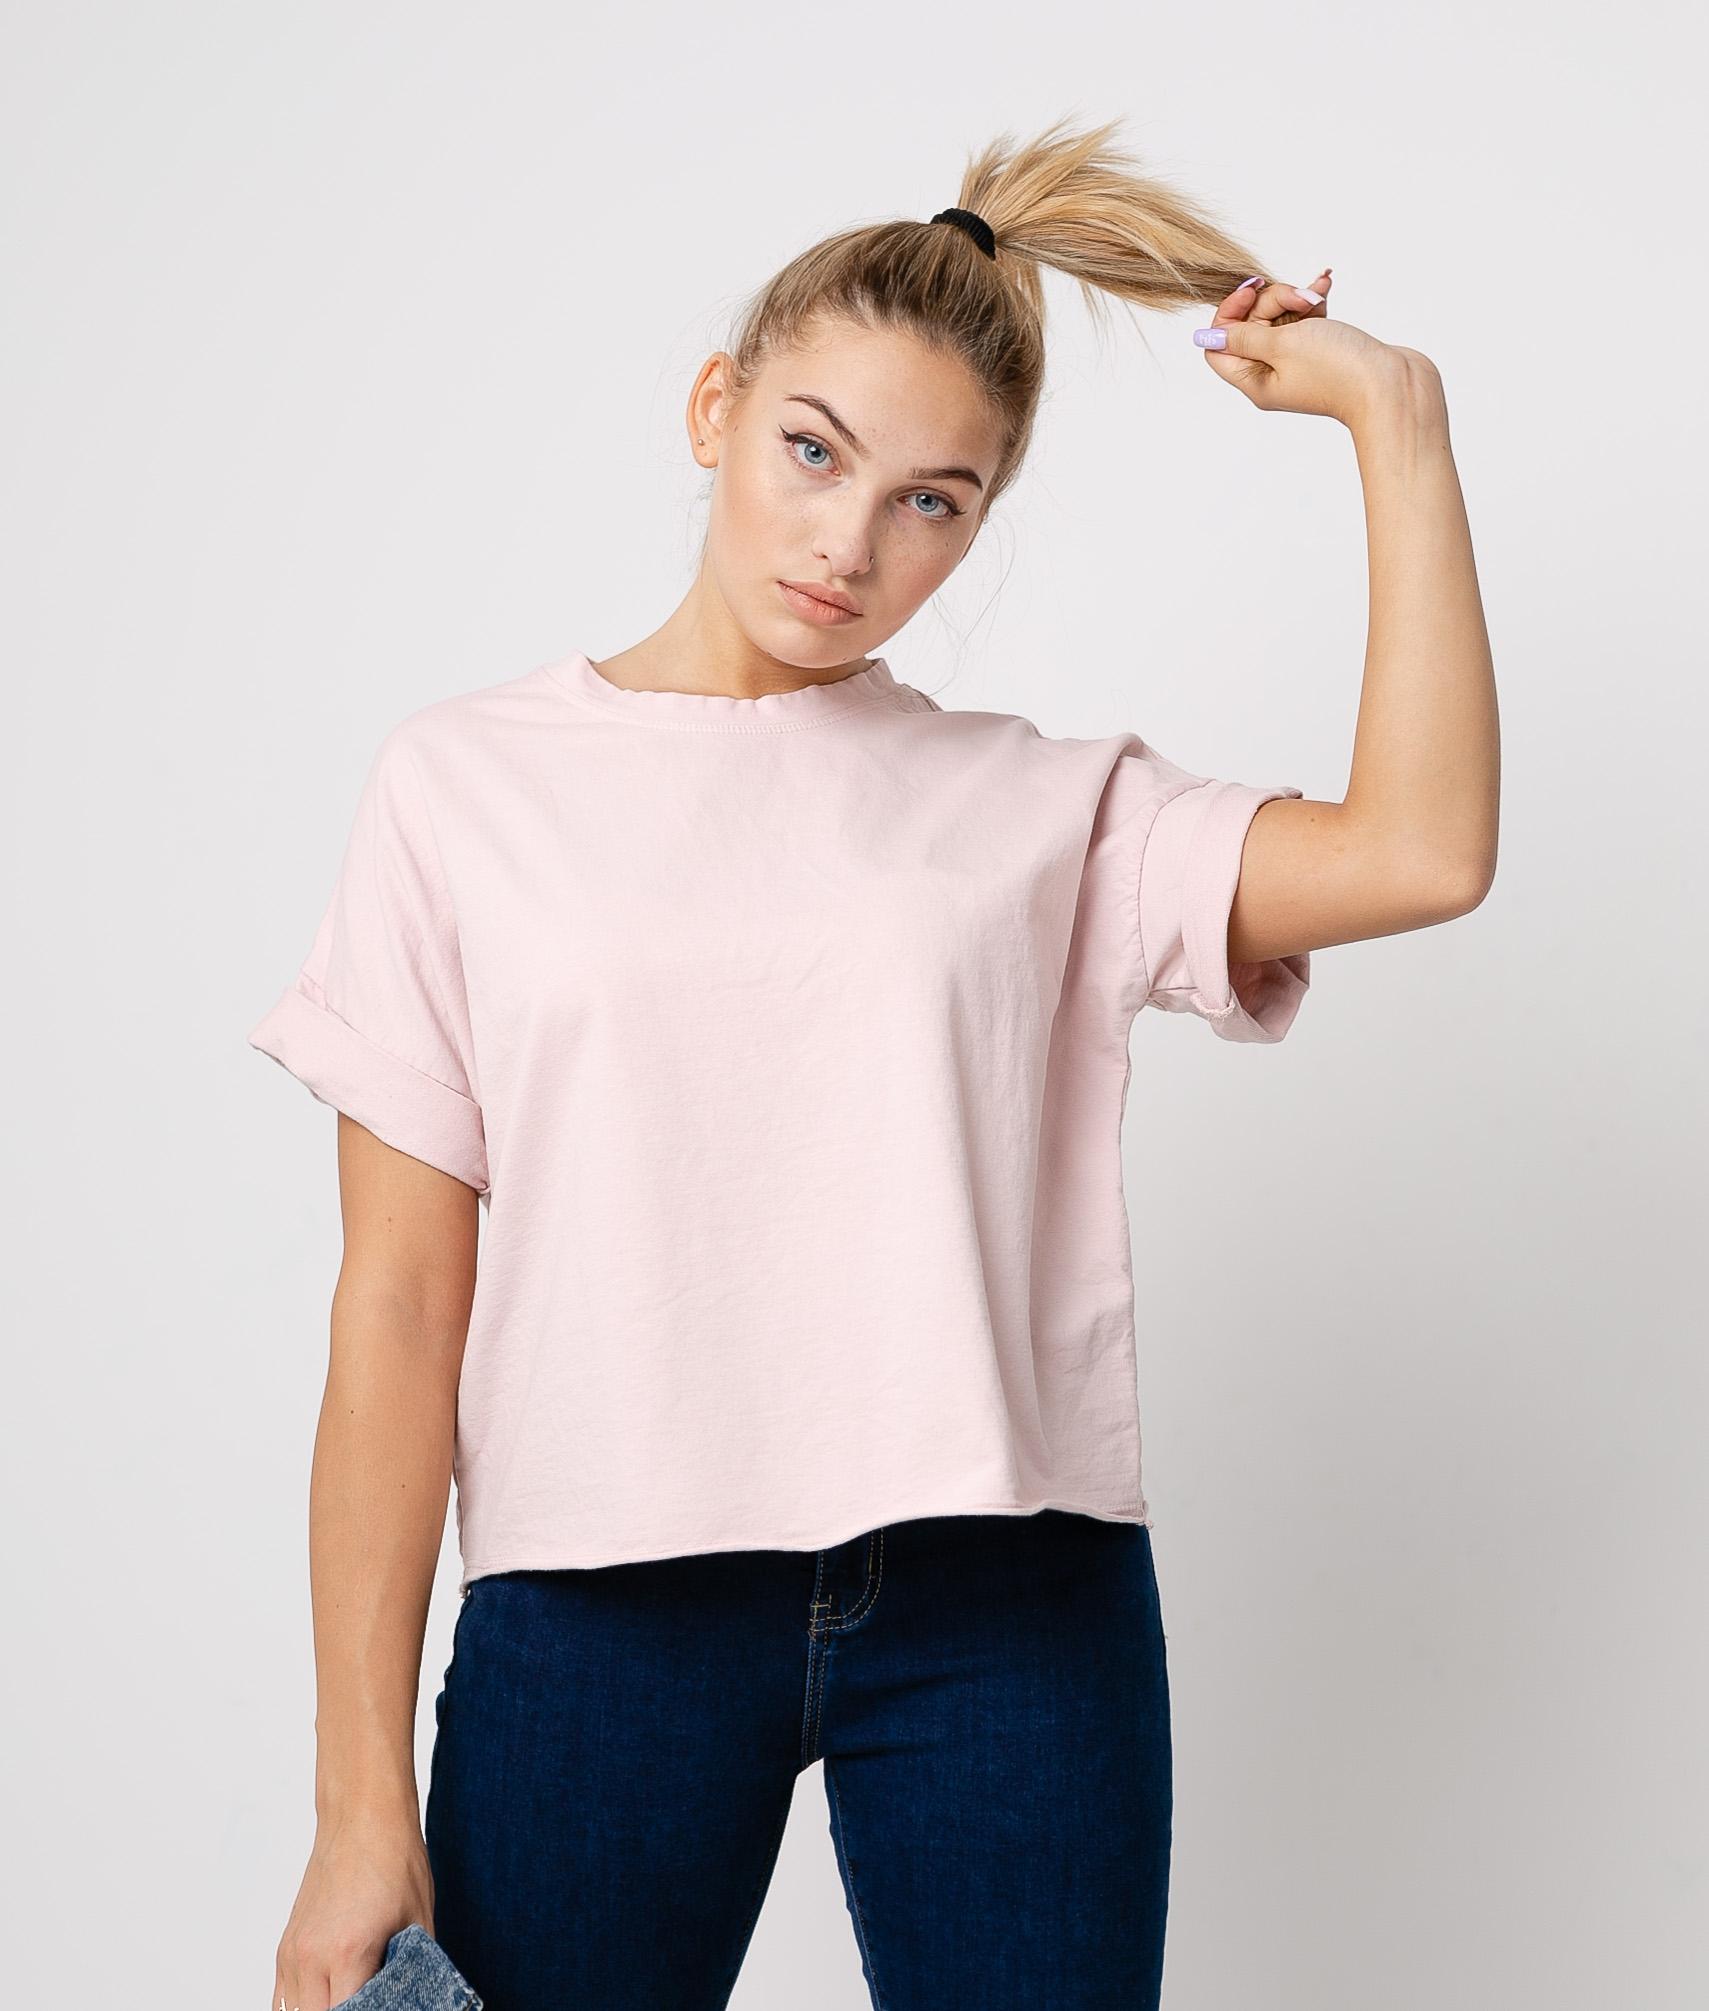 Camiseta Jere - Rosa chiaro